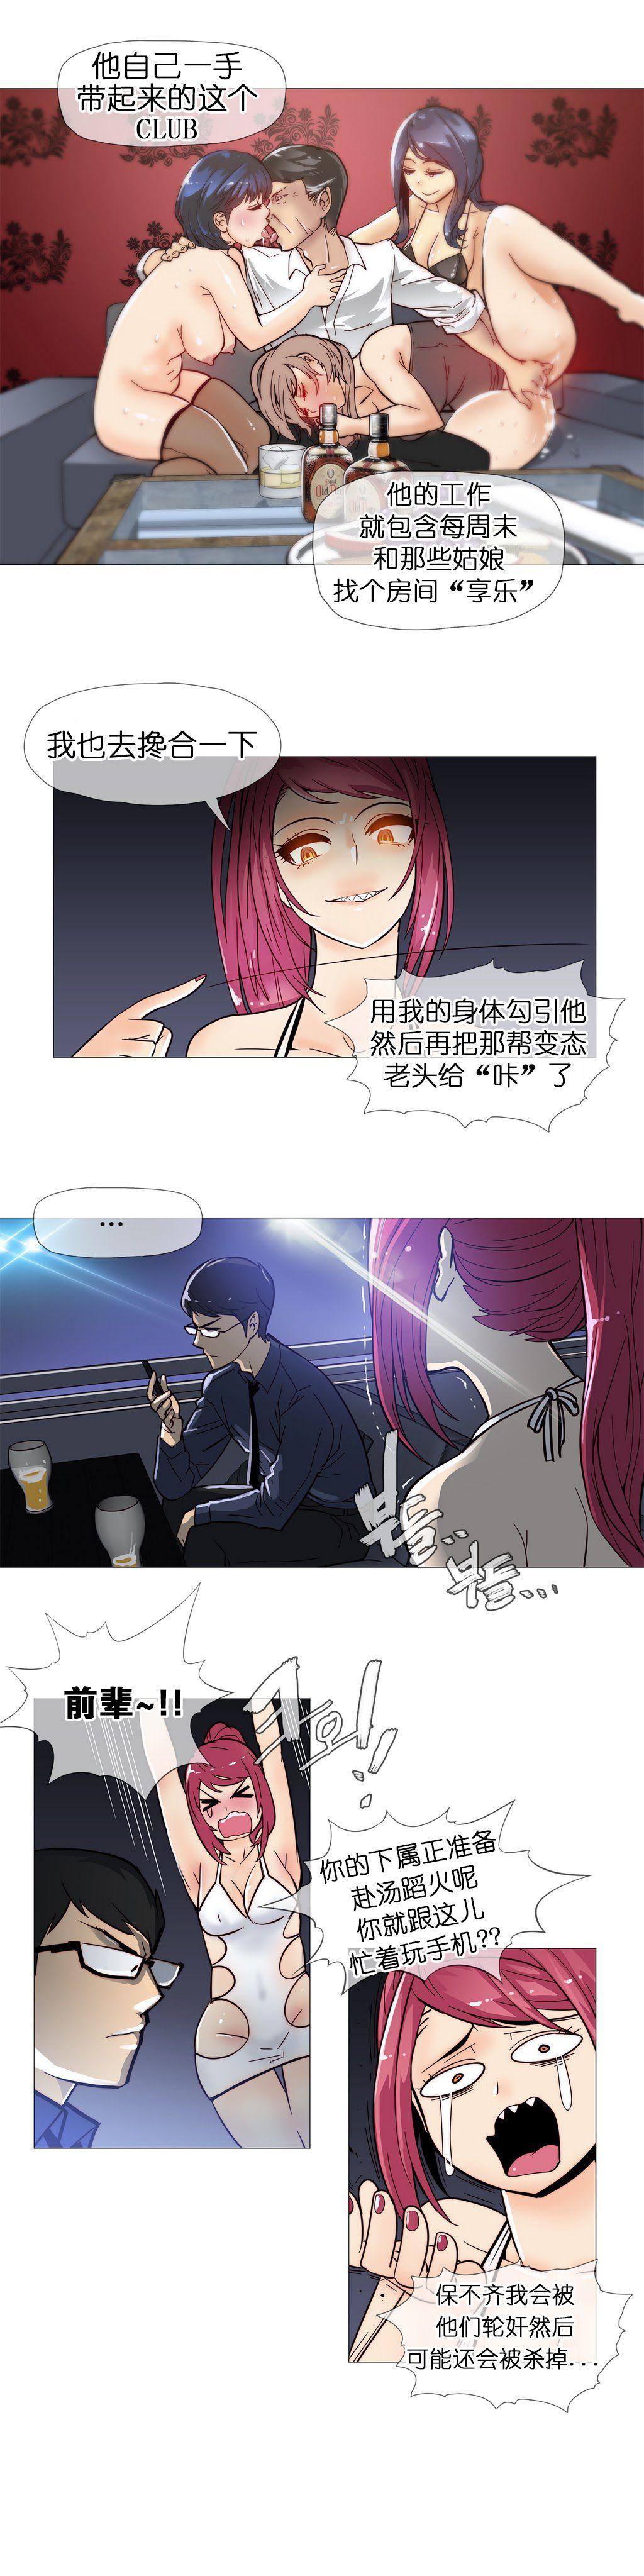 HouseHold Affairs 【卞赤鲤个人汉化】1~33话(持续更新中) 180